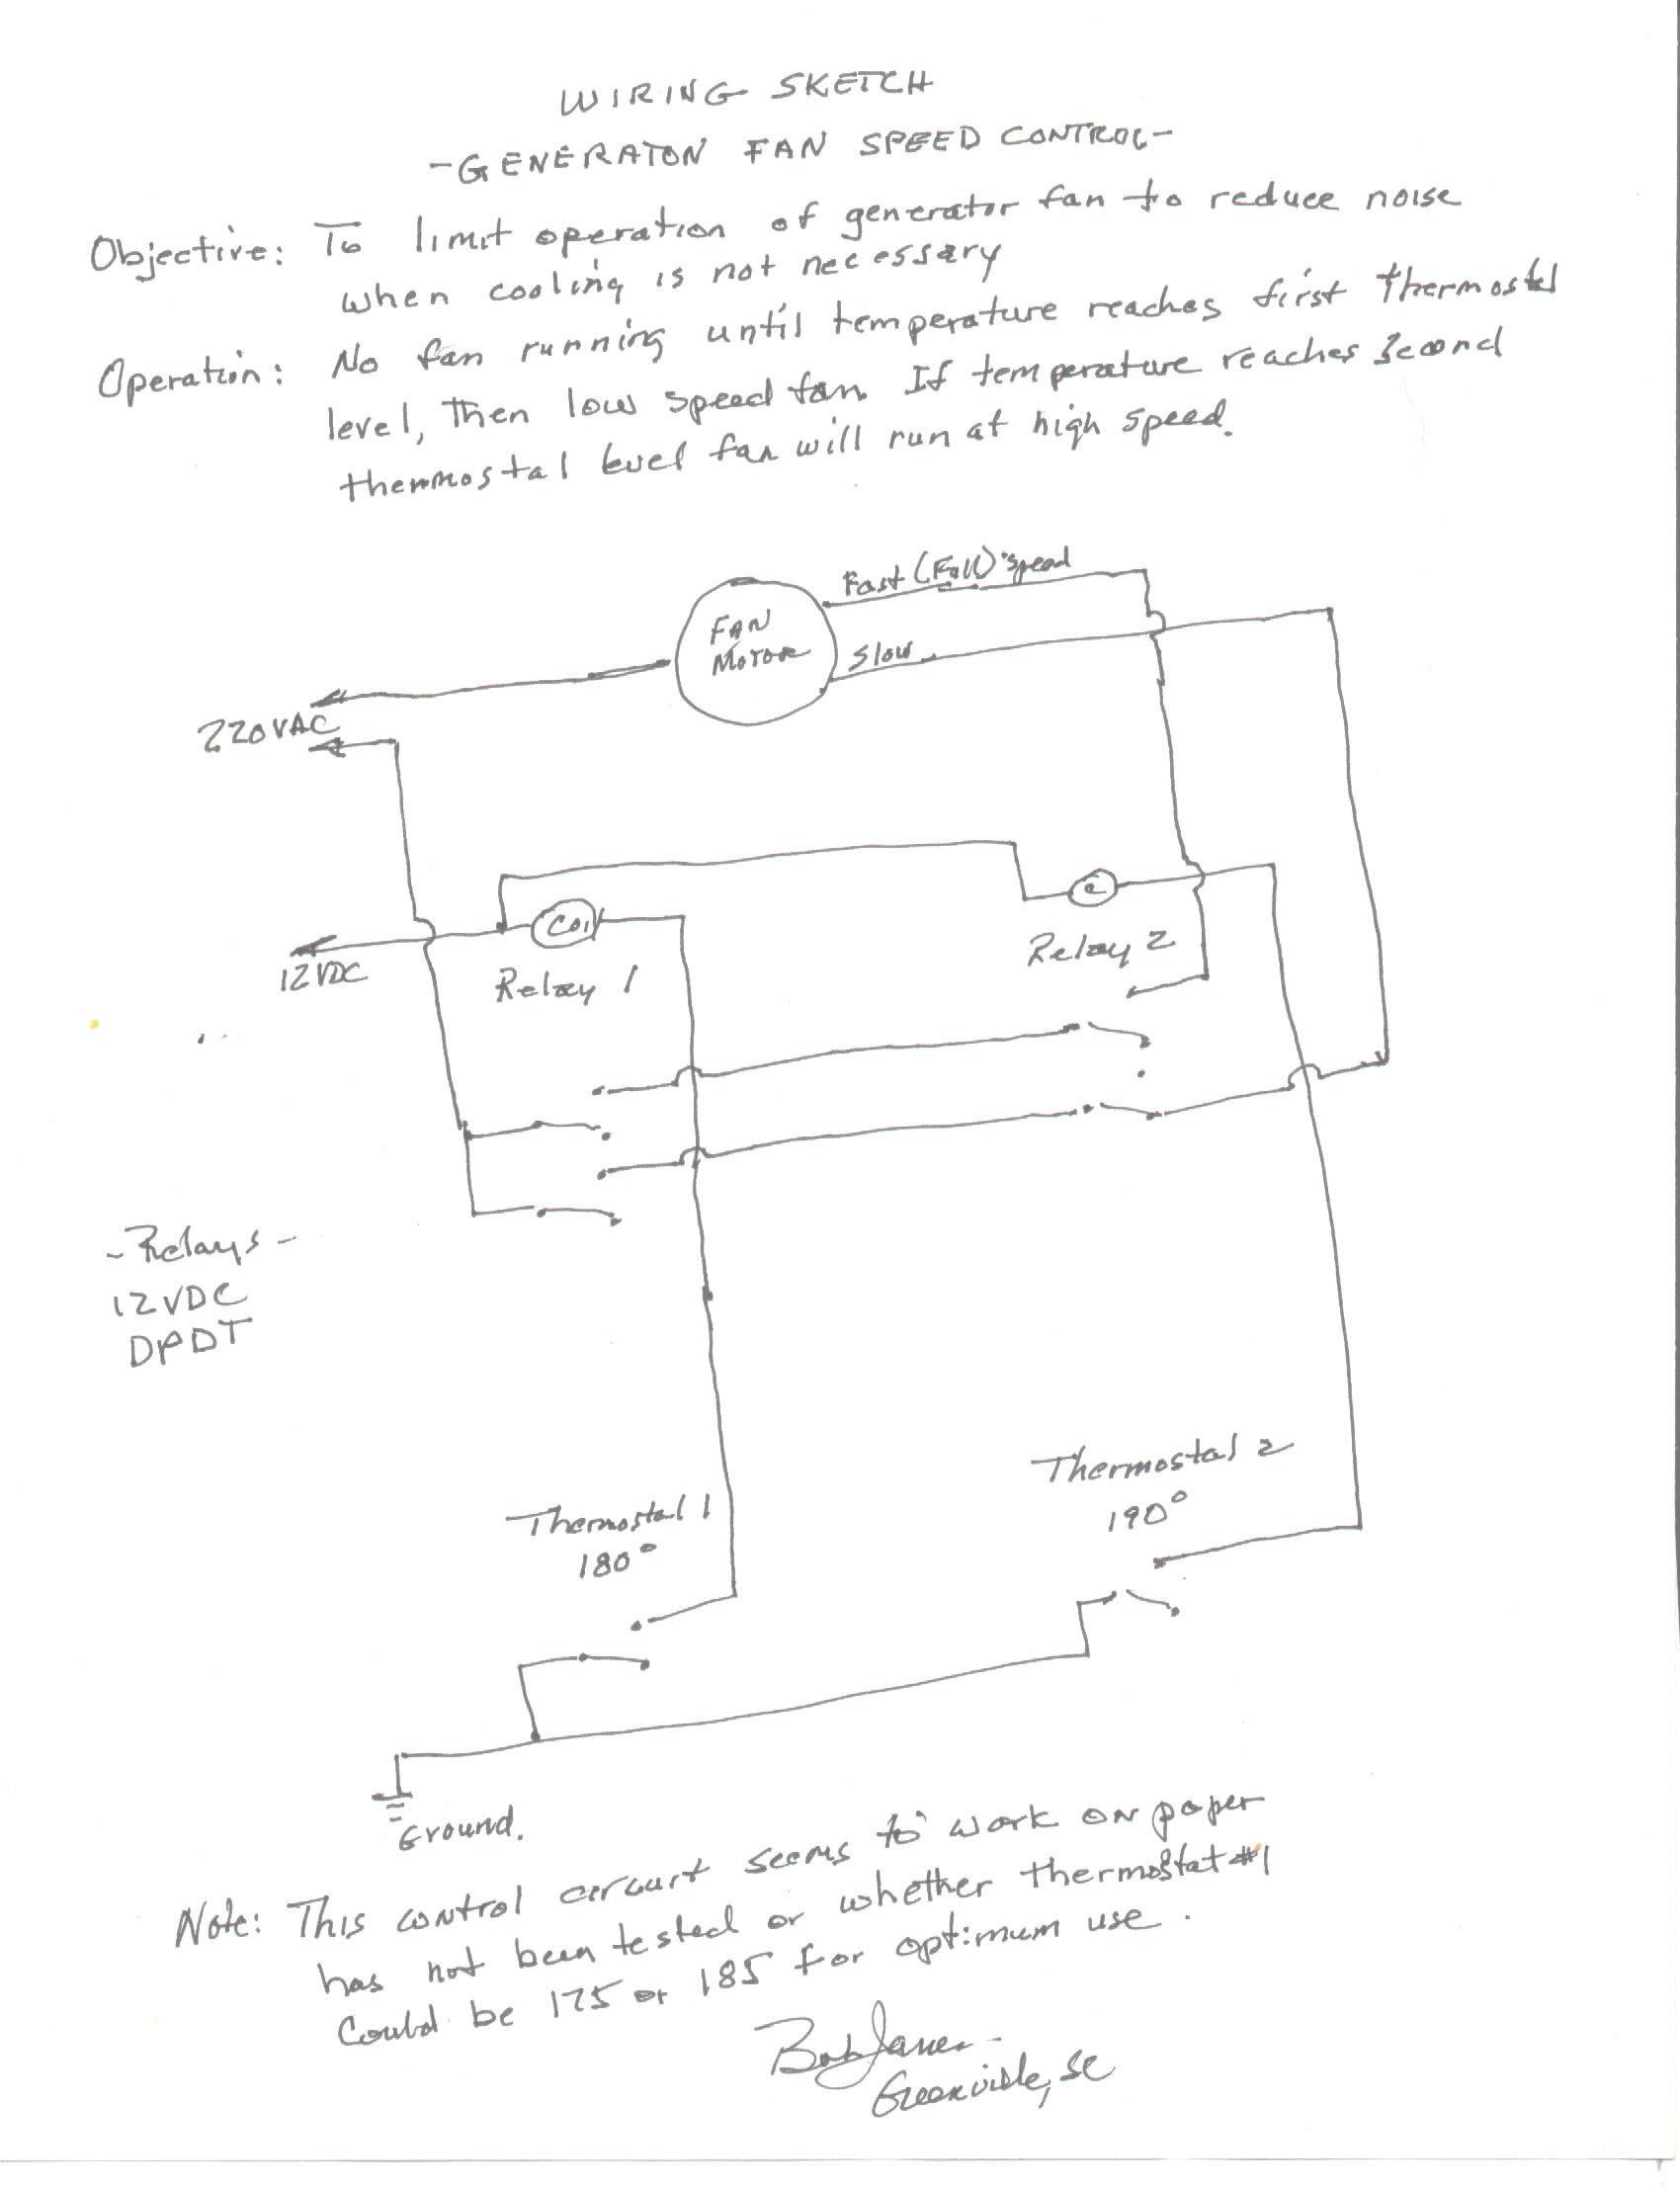 135779 ONAN MDKC-MDKD GEN CONTROLWIRING.pdf